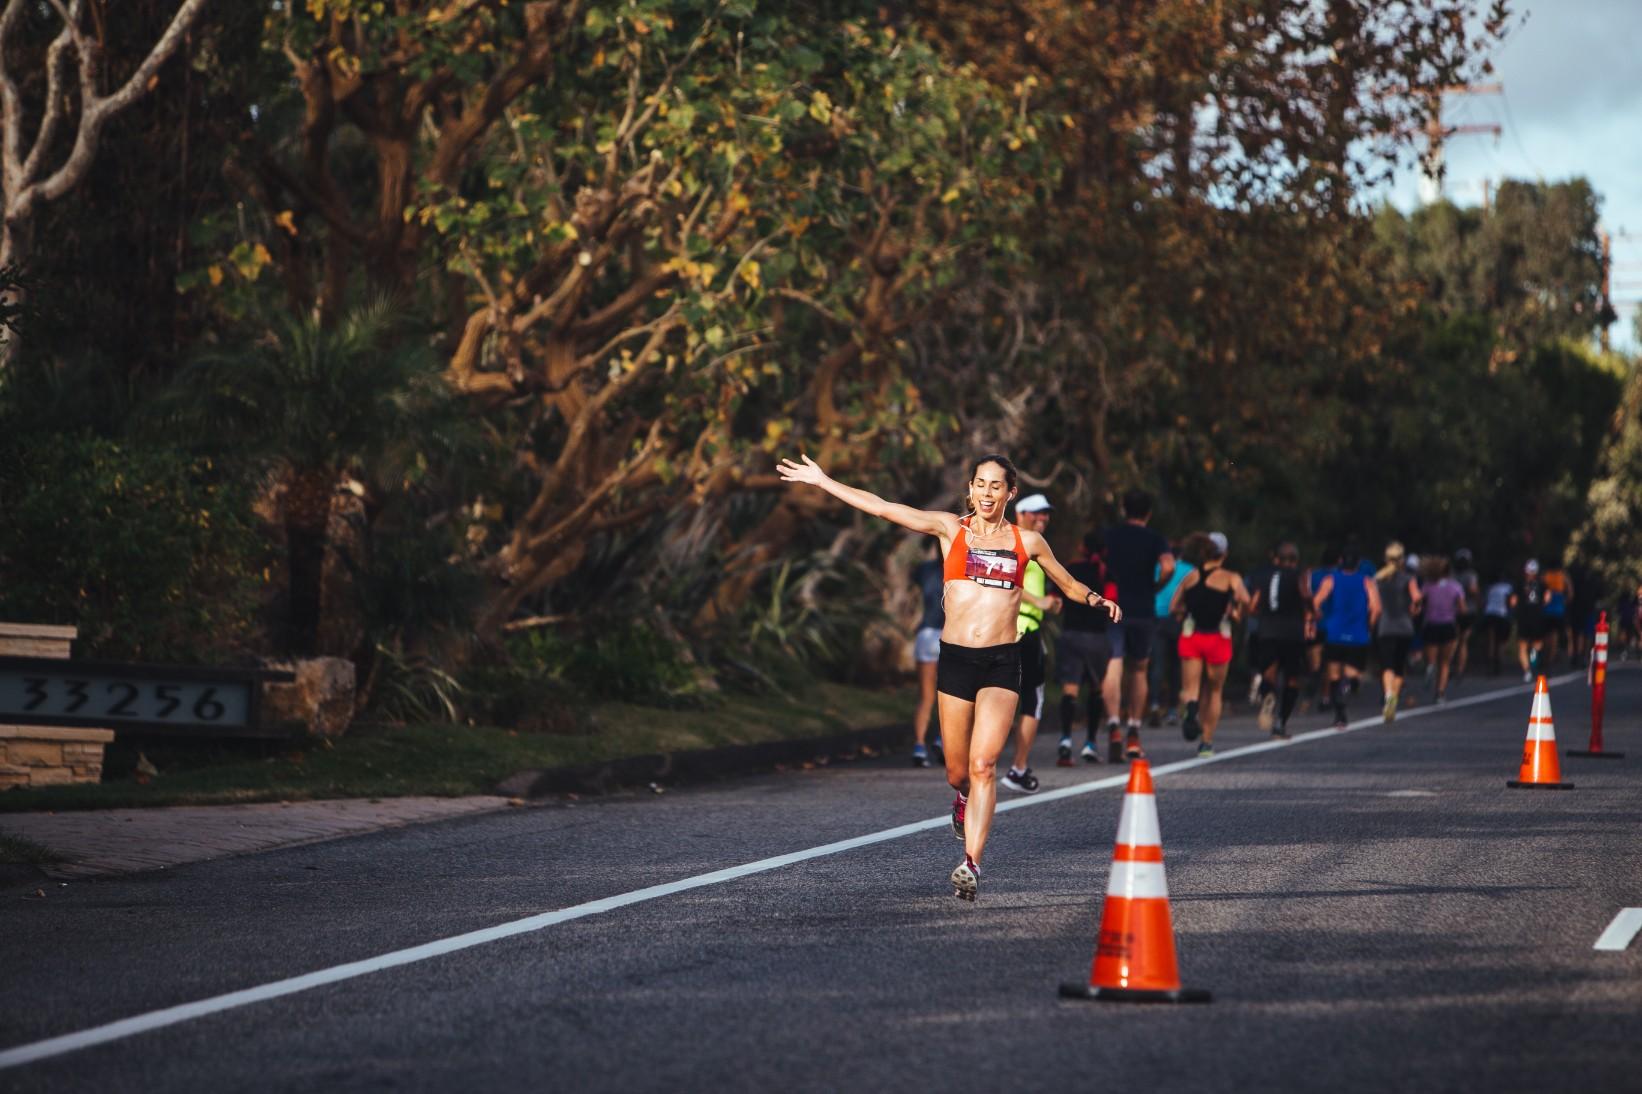 Liz Blackwell passes the finish line to take first place in the Malibu Half Marathon.